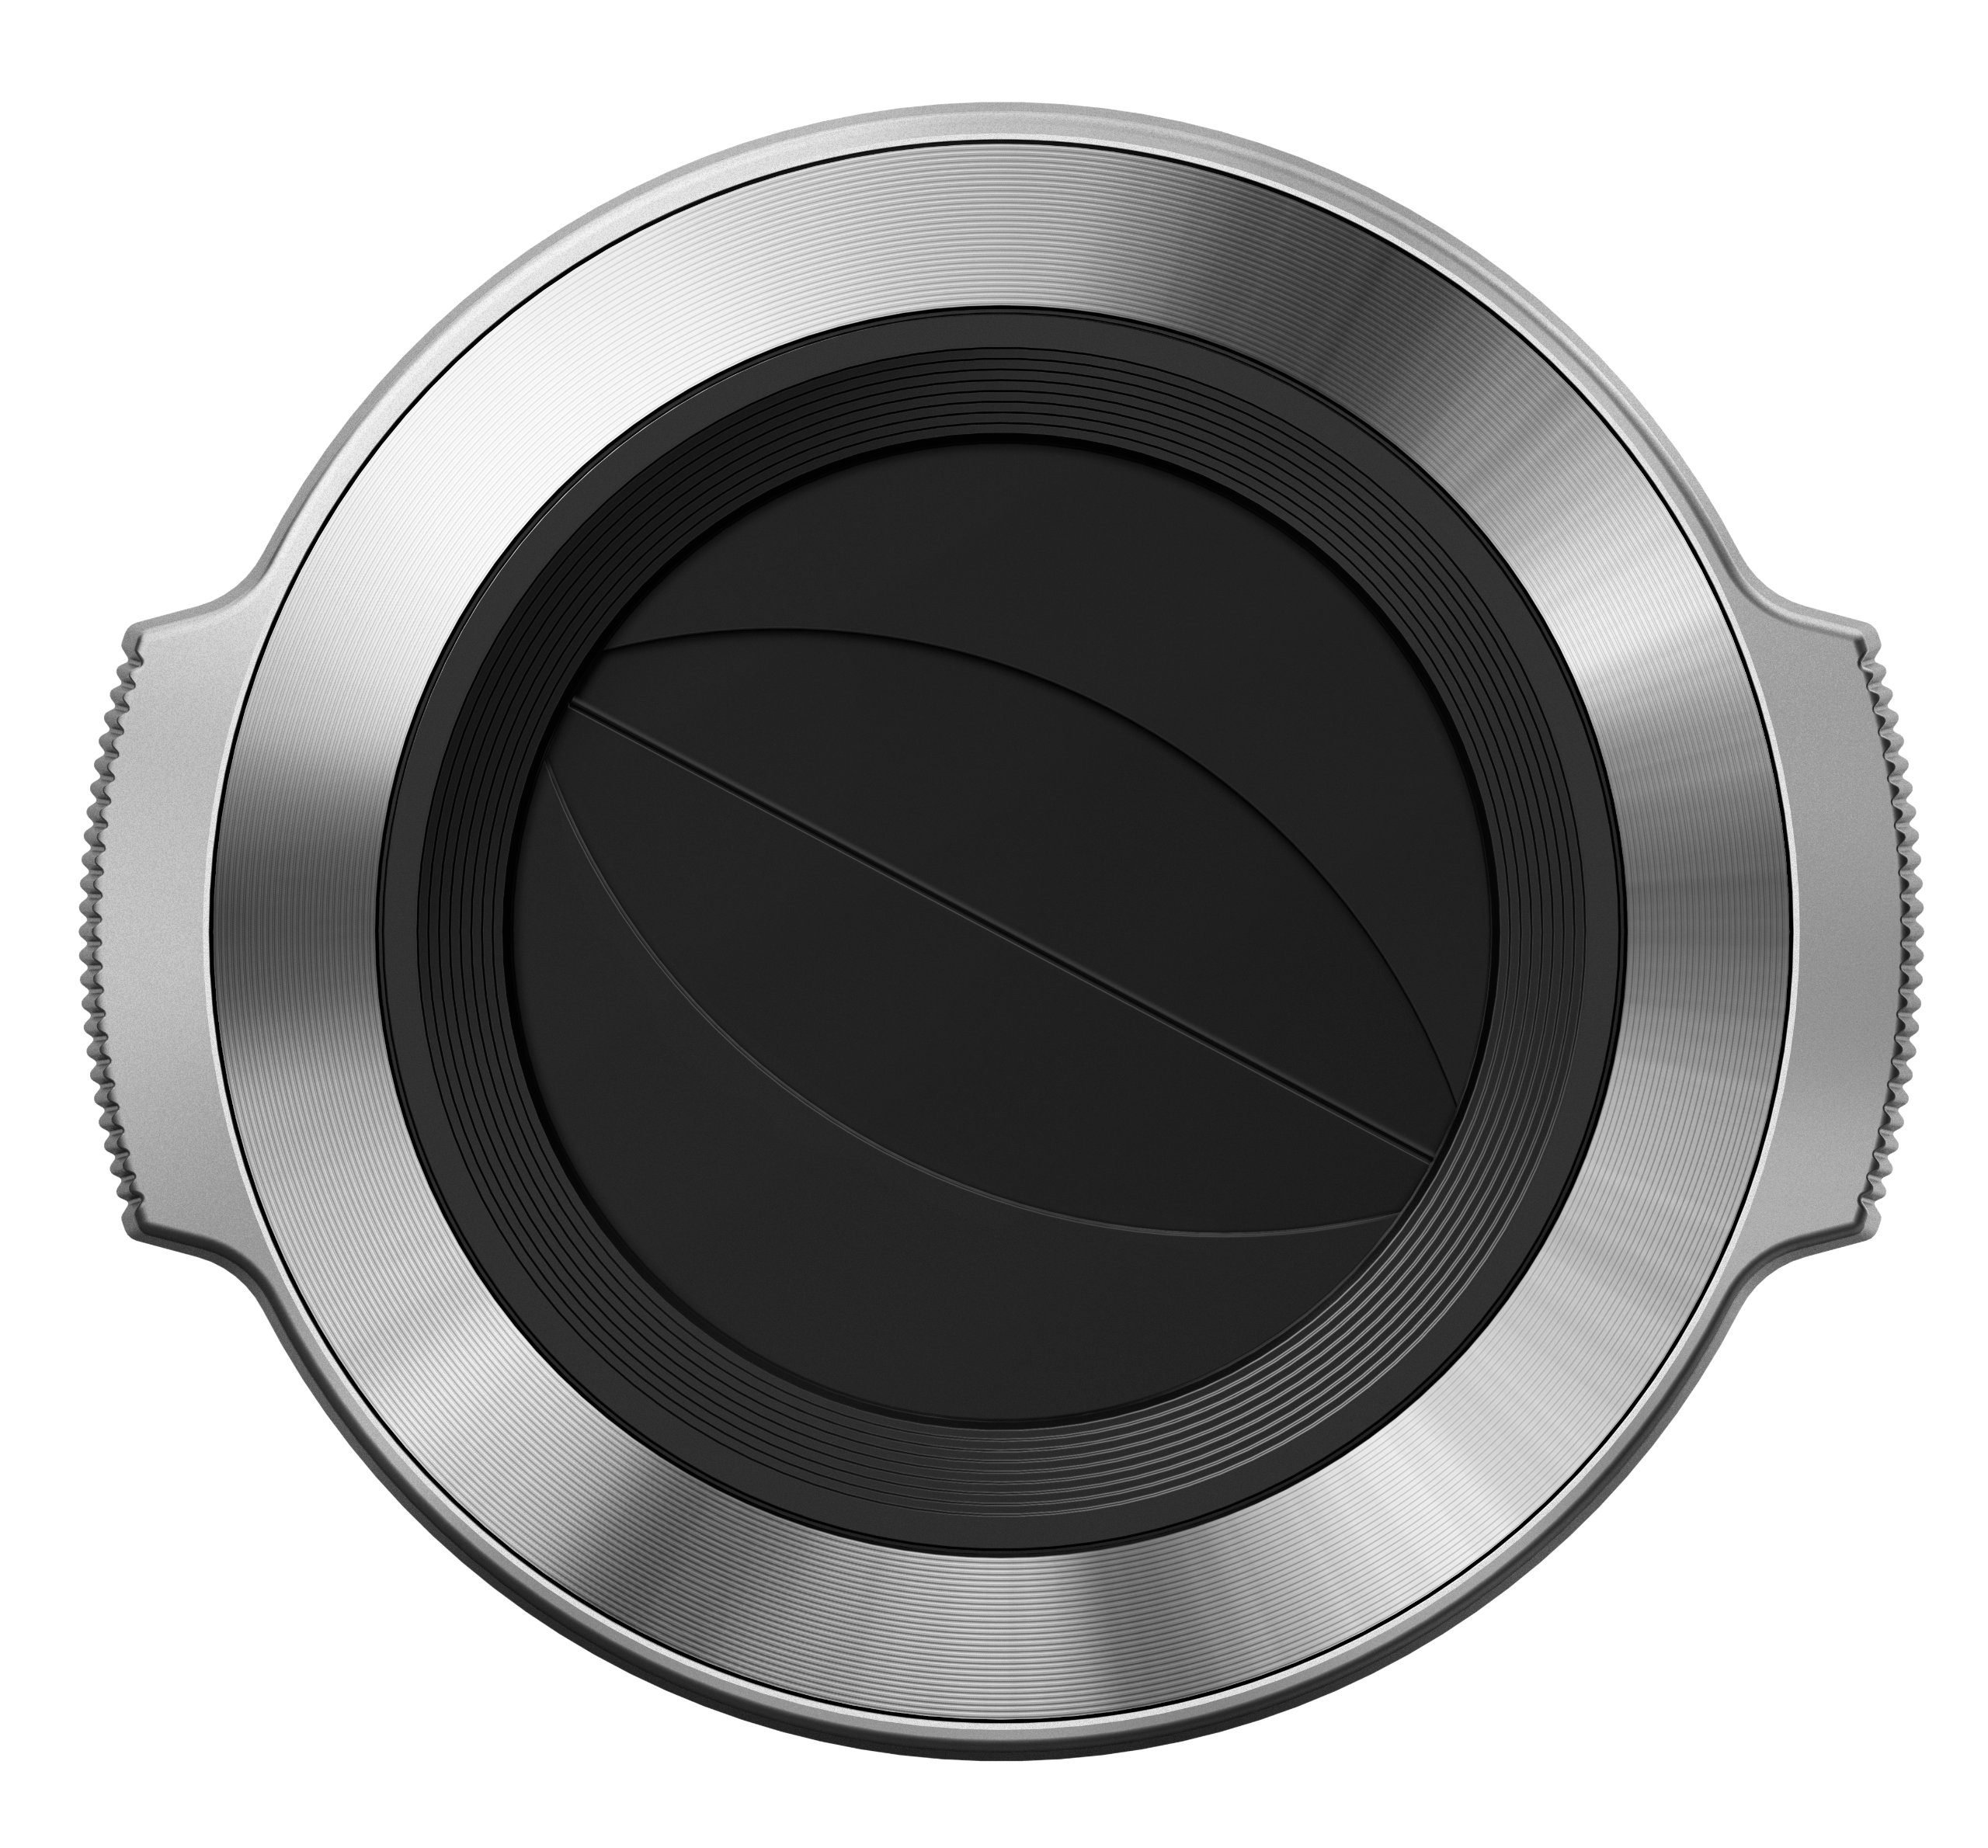 Olympus Lens Cap Auto Open LC-37C Silver for 14-42mm EZ (Silver)